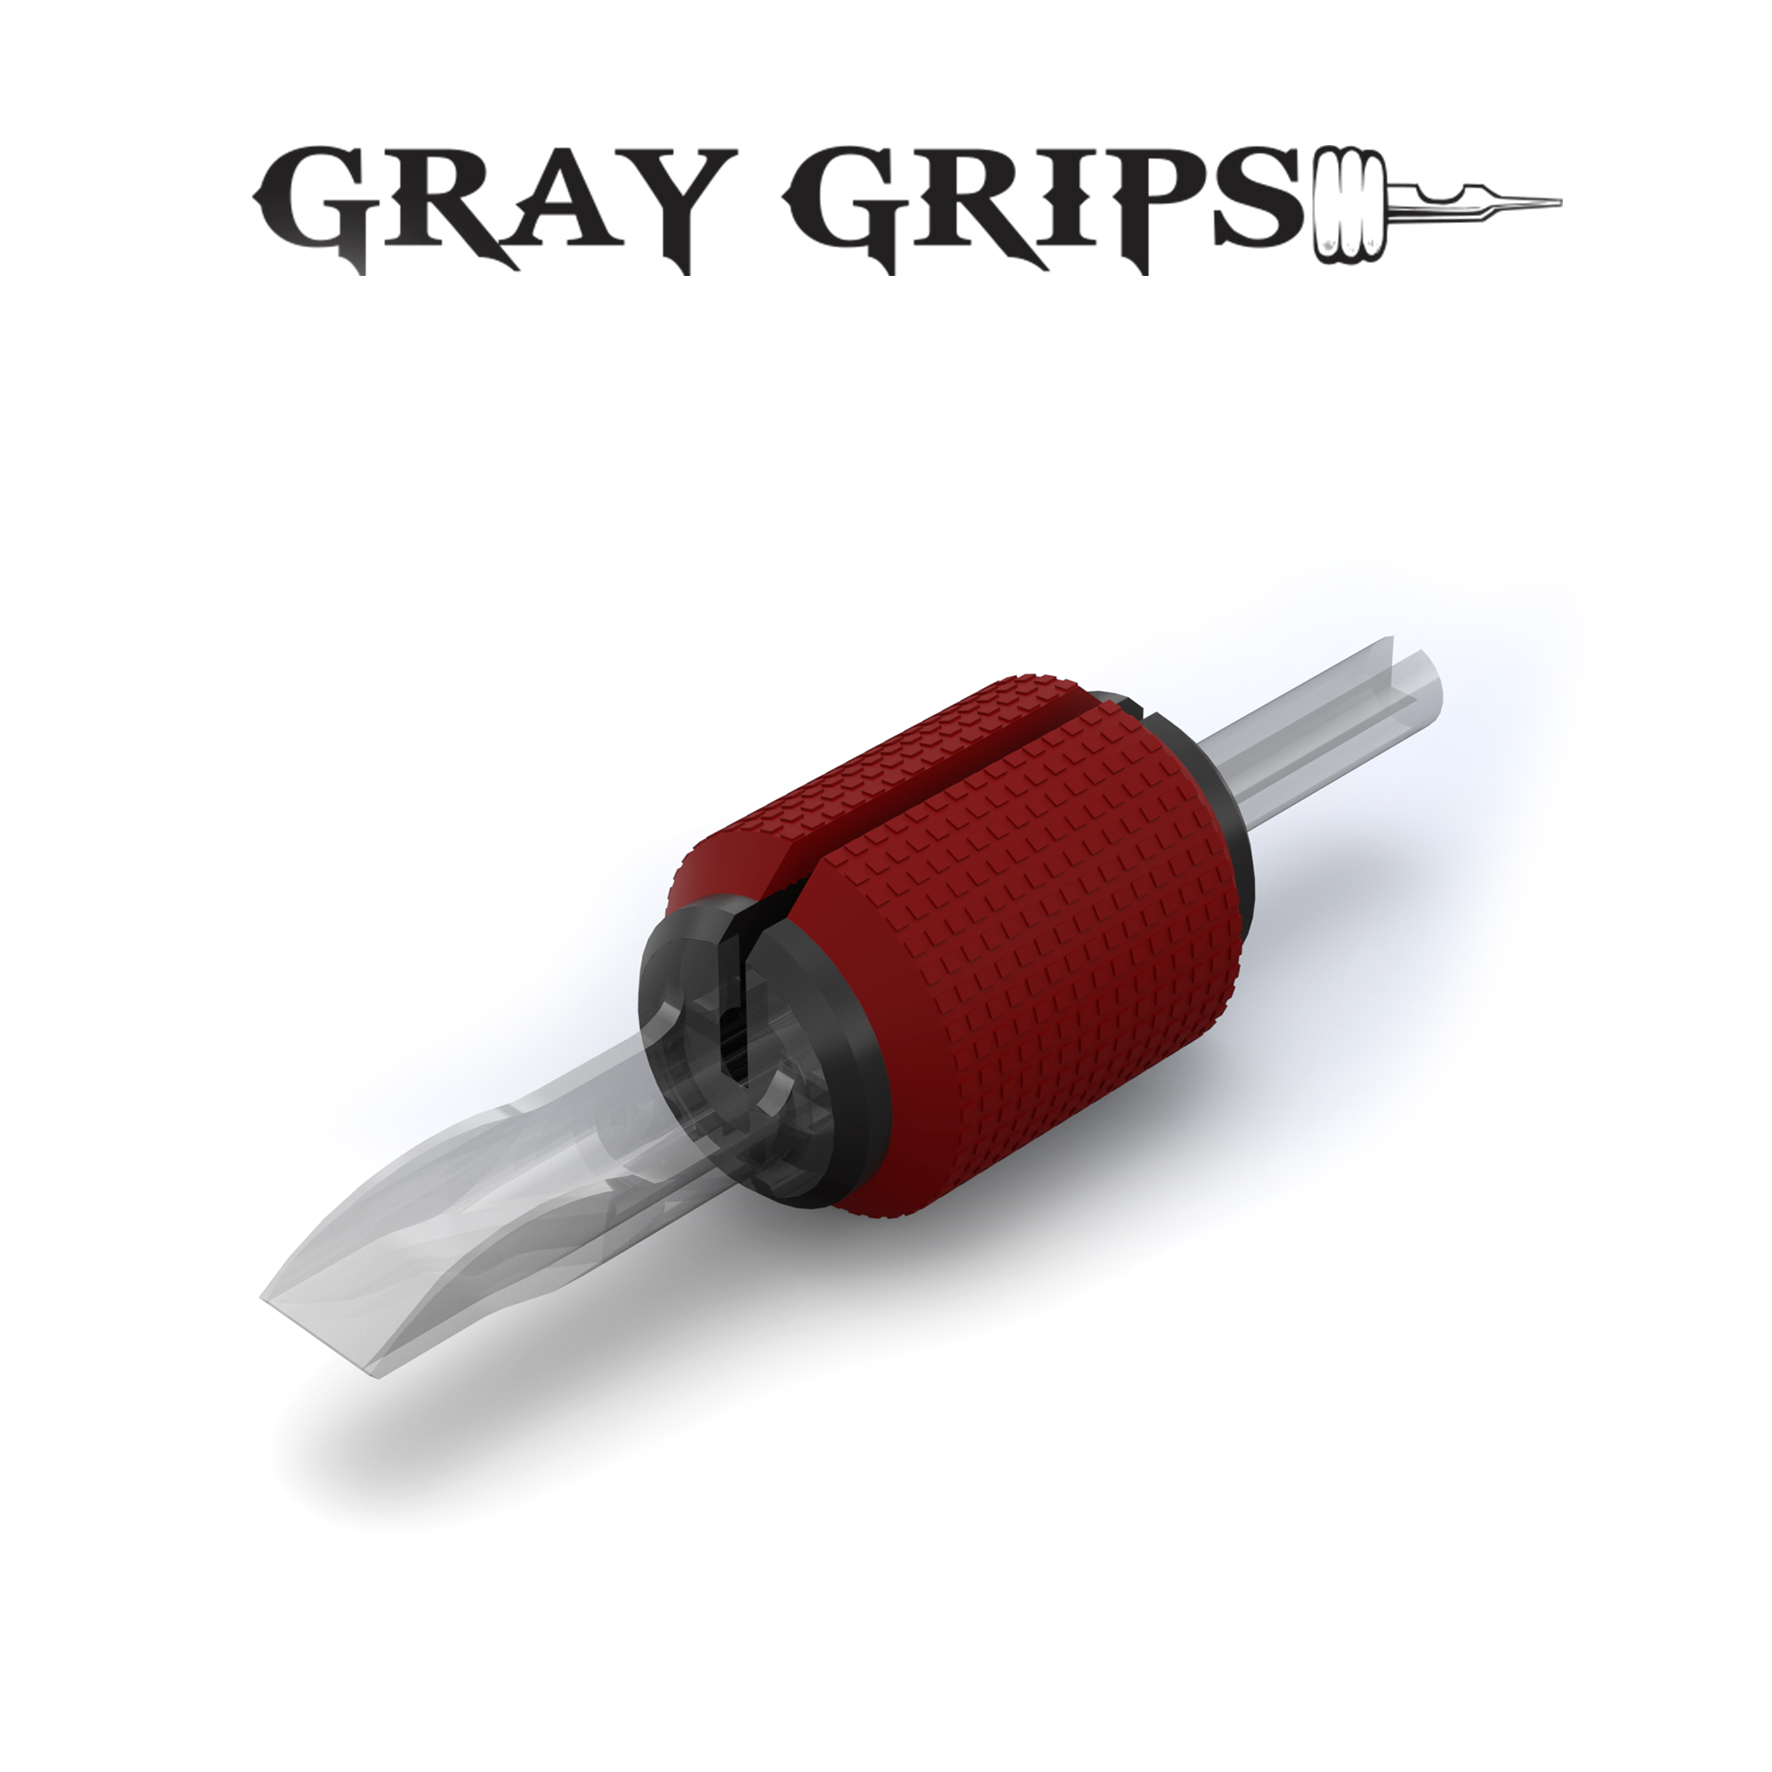 GRAY GRIPS™